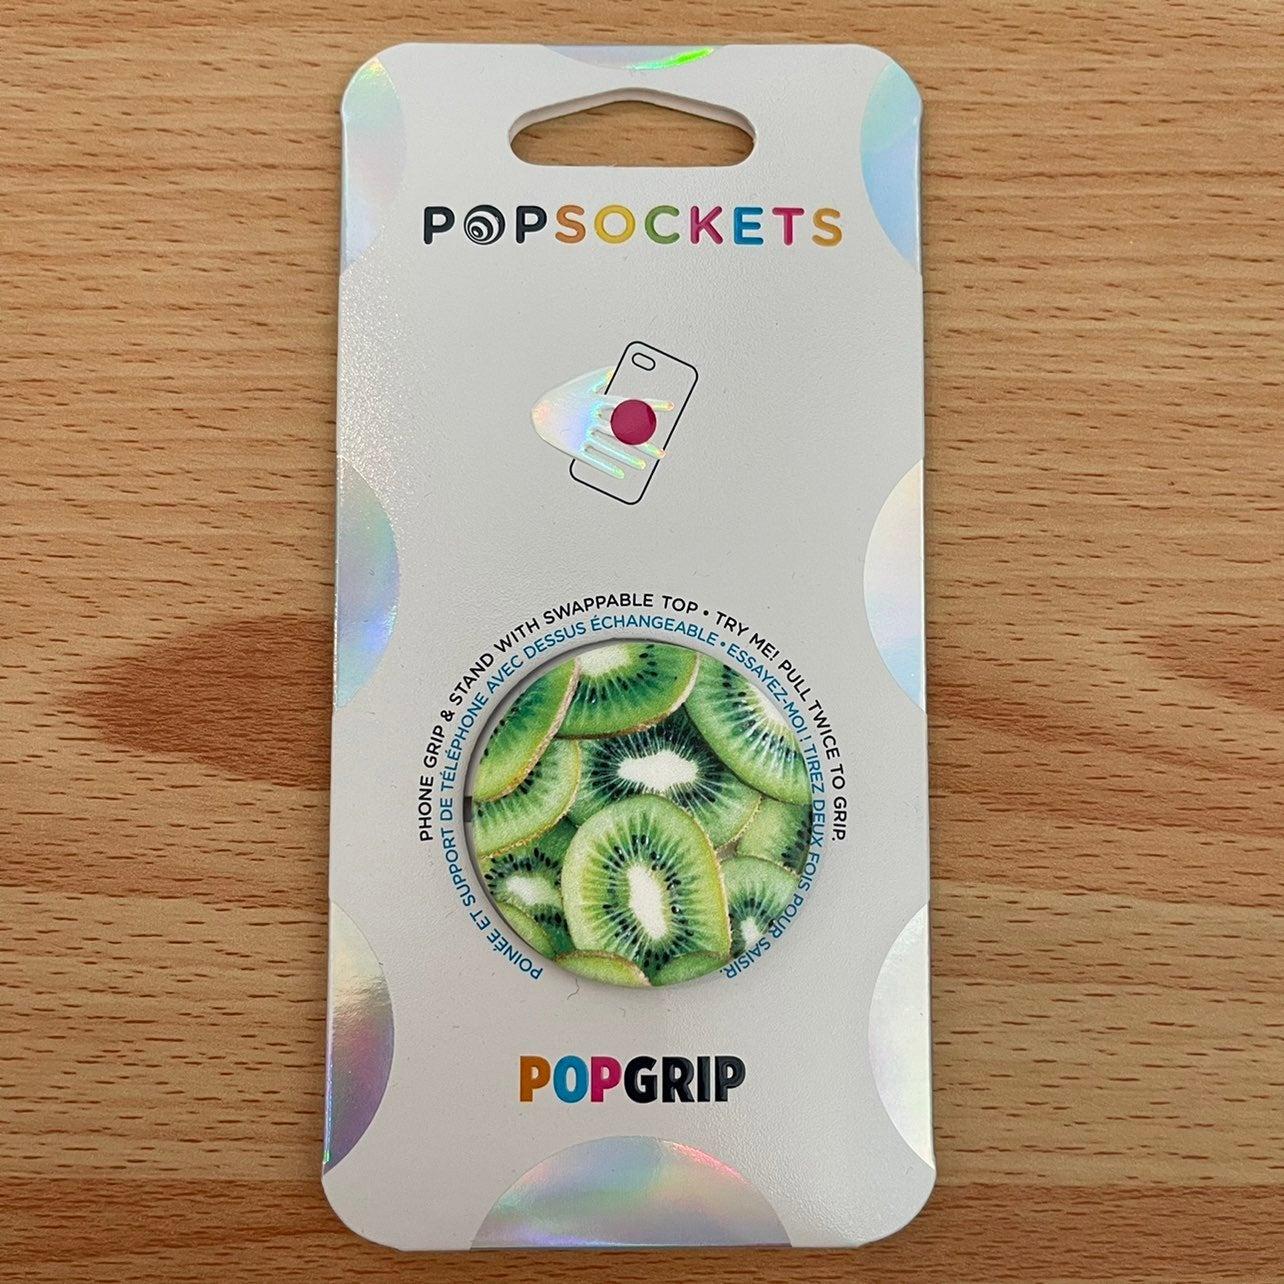 Popsocket Popgrip Kiwi